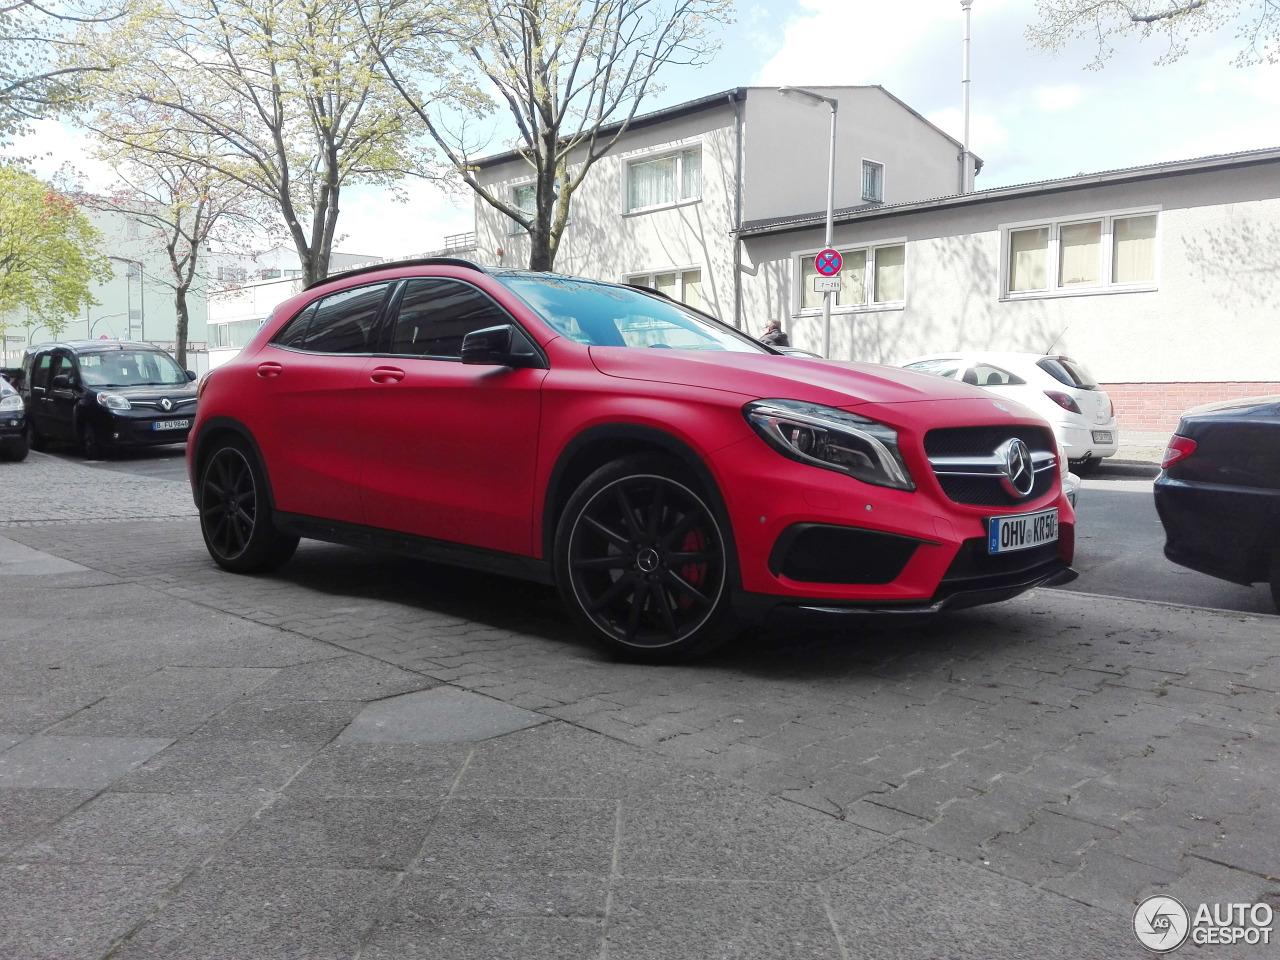 Mercedes benz gla 45 amg x156 20 april 2017 autogespot for 2017 mercedes benz amg gla 45